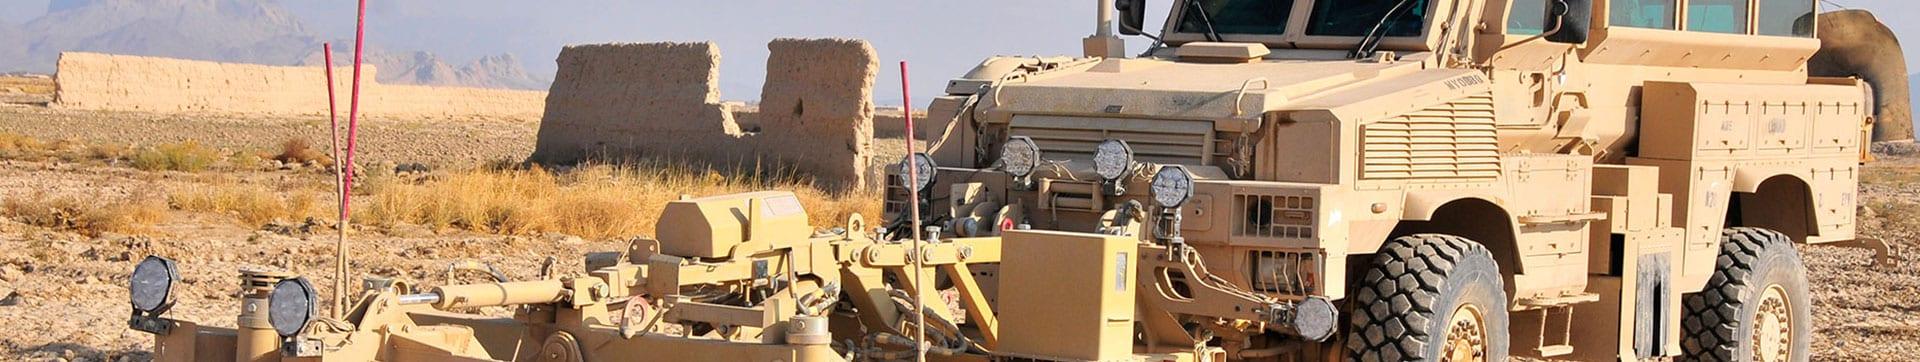 combat-engineering equipment